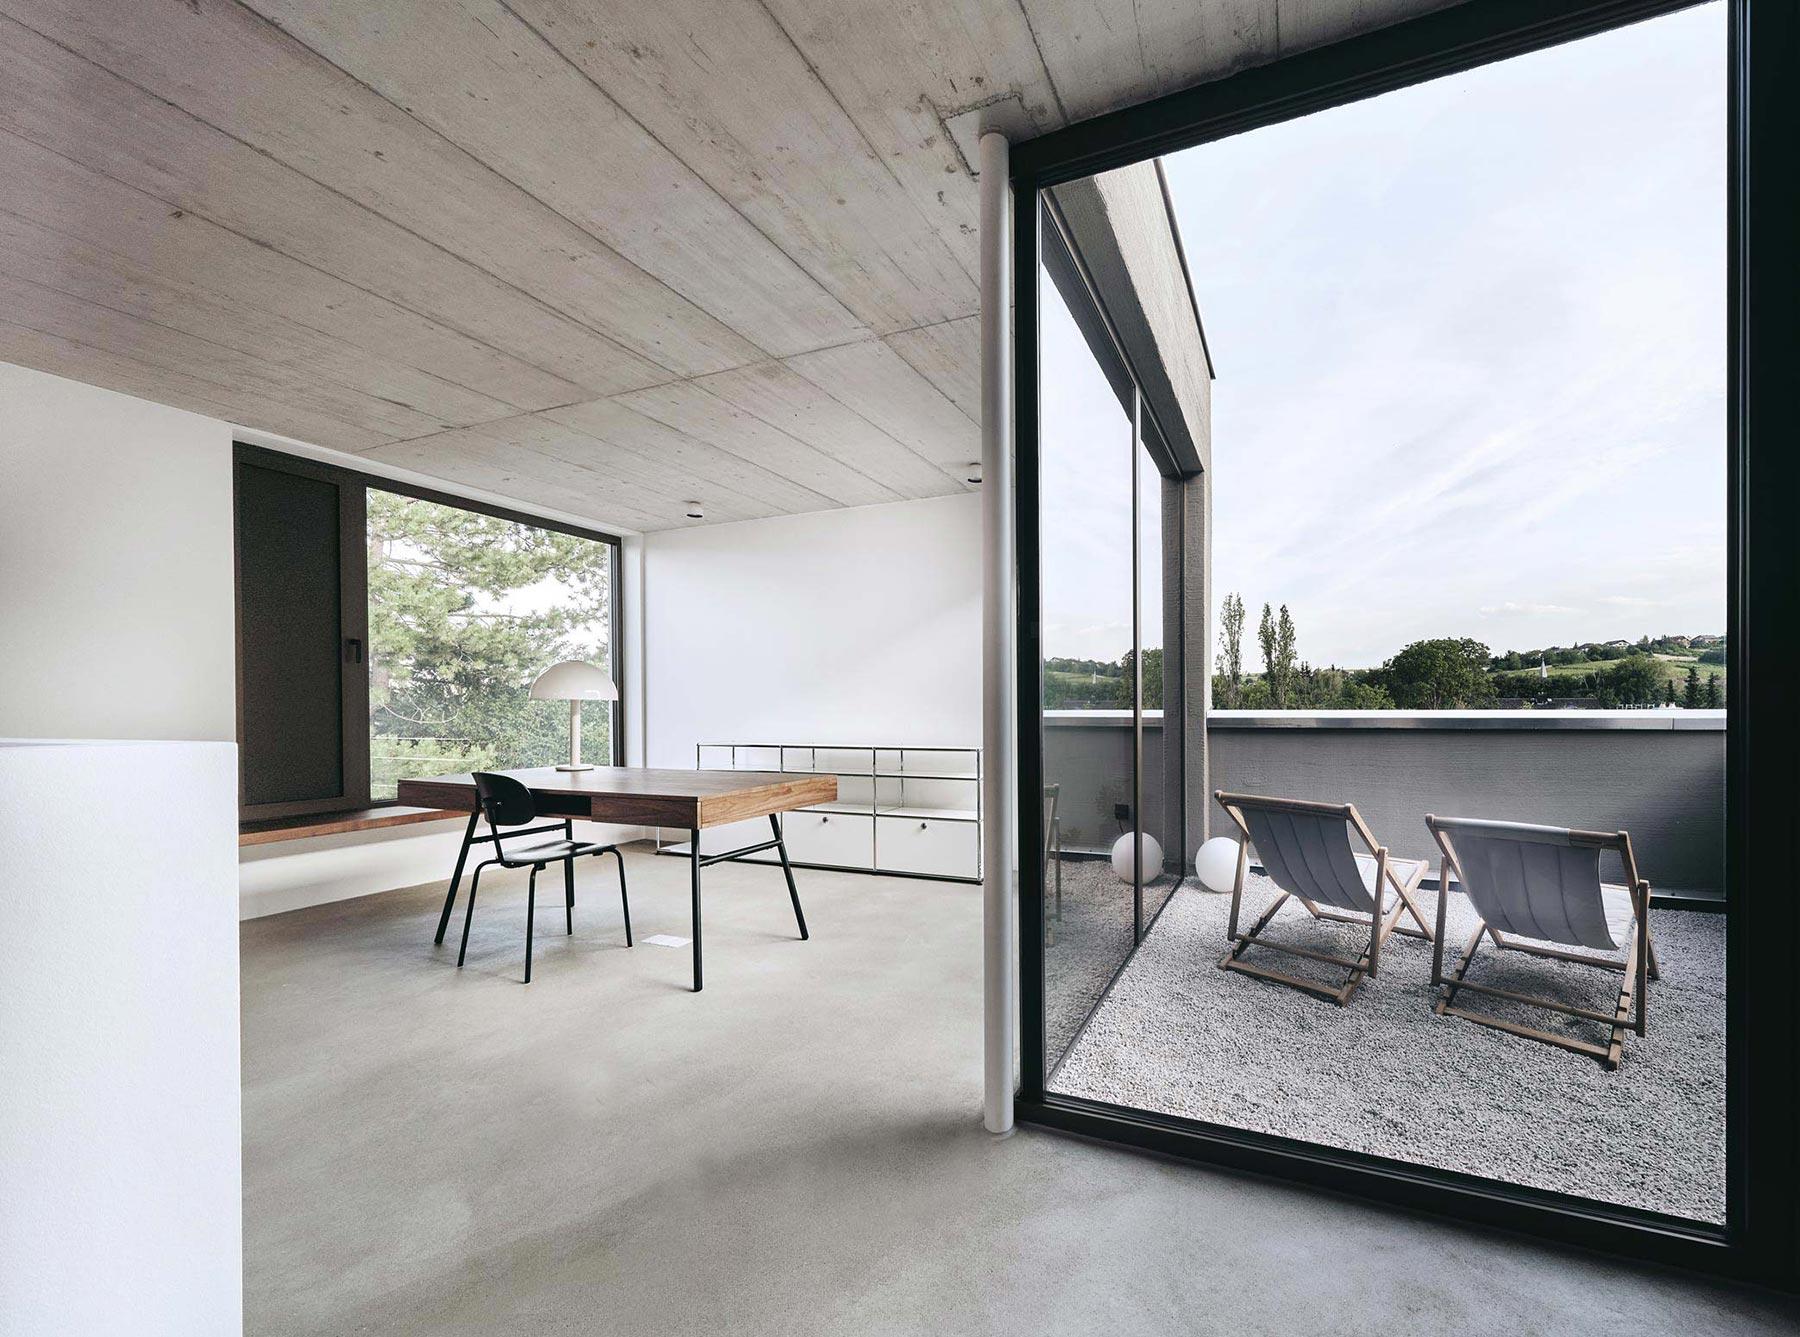 Architekturfotograf-Mainz-Wiesbaden Darmstadt-Frankfurt-am-Main